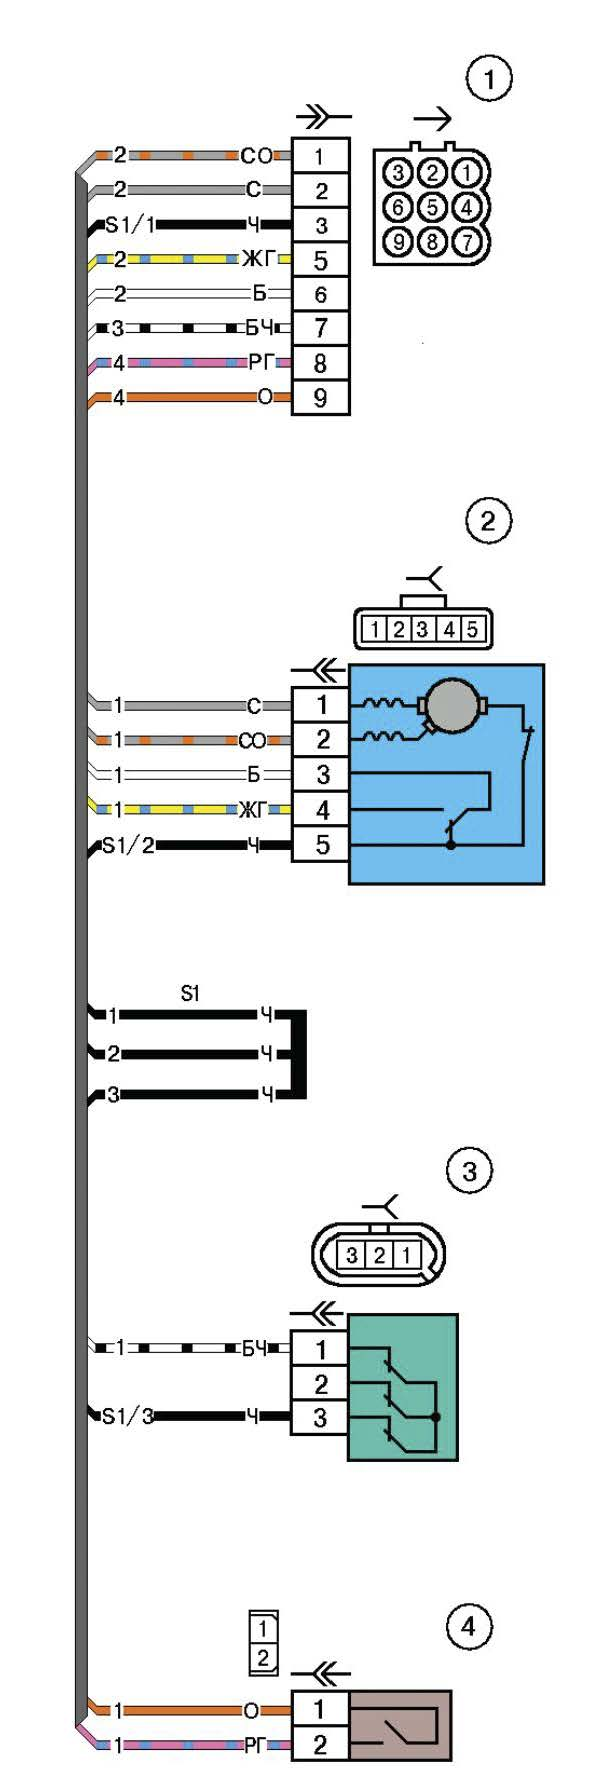 Схема электрических соединений жгута коробки воздухопритока автомобиля Лада Калина (LADA 1117 LADA 1118 LADA 1119)